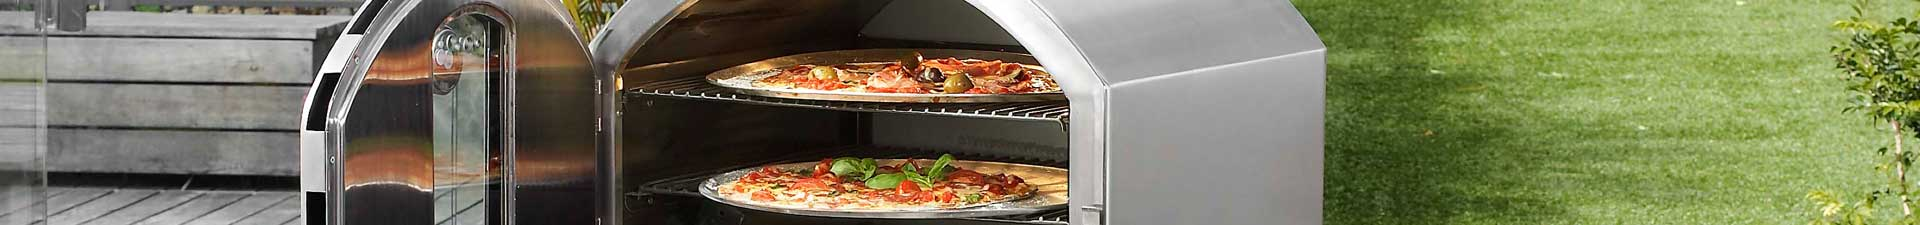 pizzaovenbanner-wfnbpiqqtyos.jpg